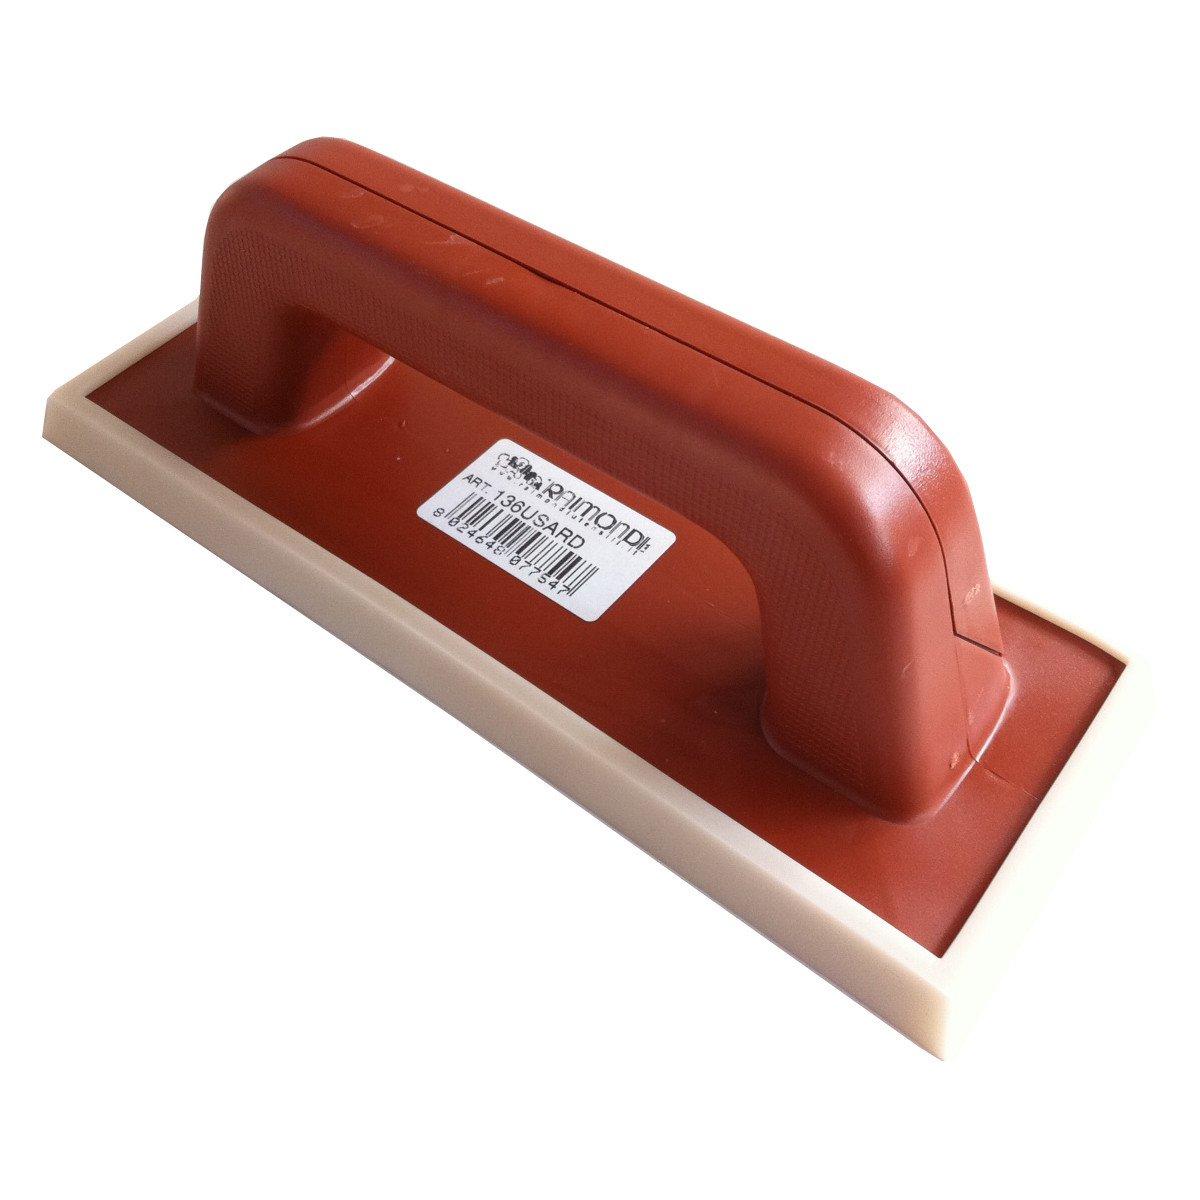 Bon 82-400 12 Mahogany Float with Wood Handle